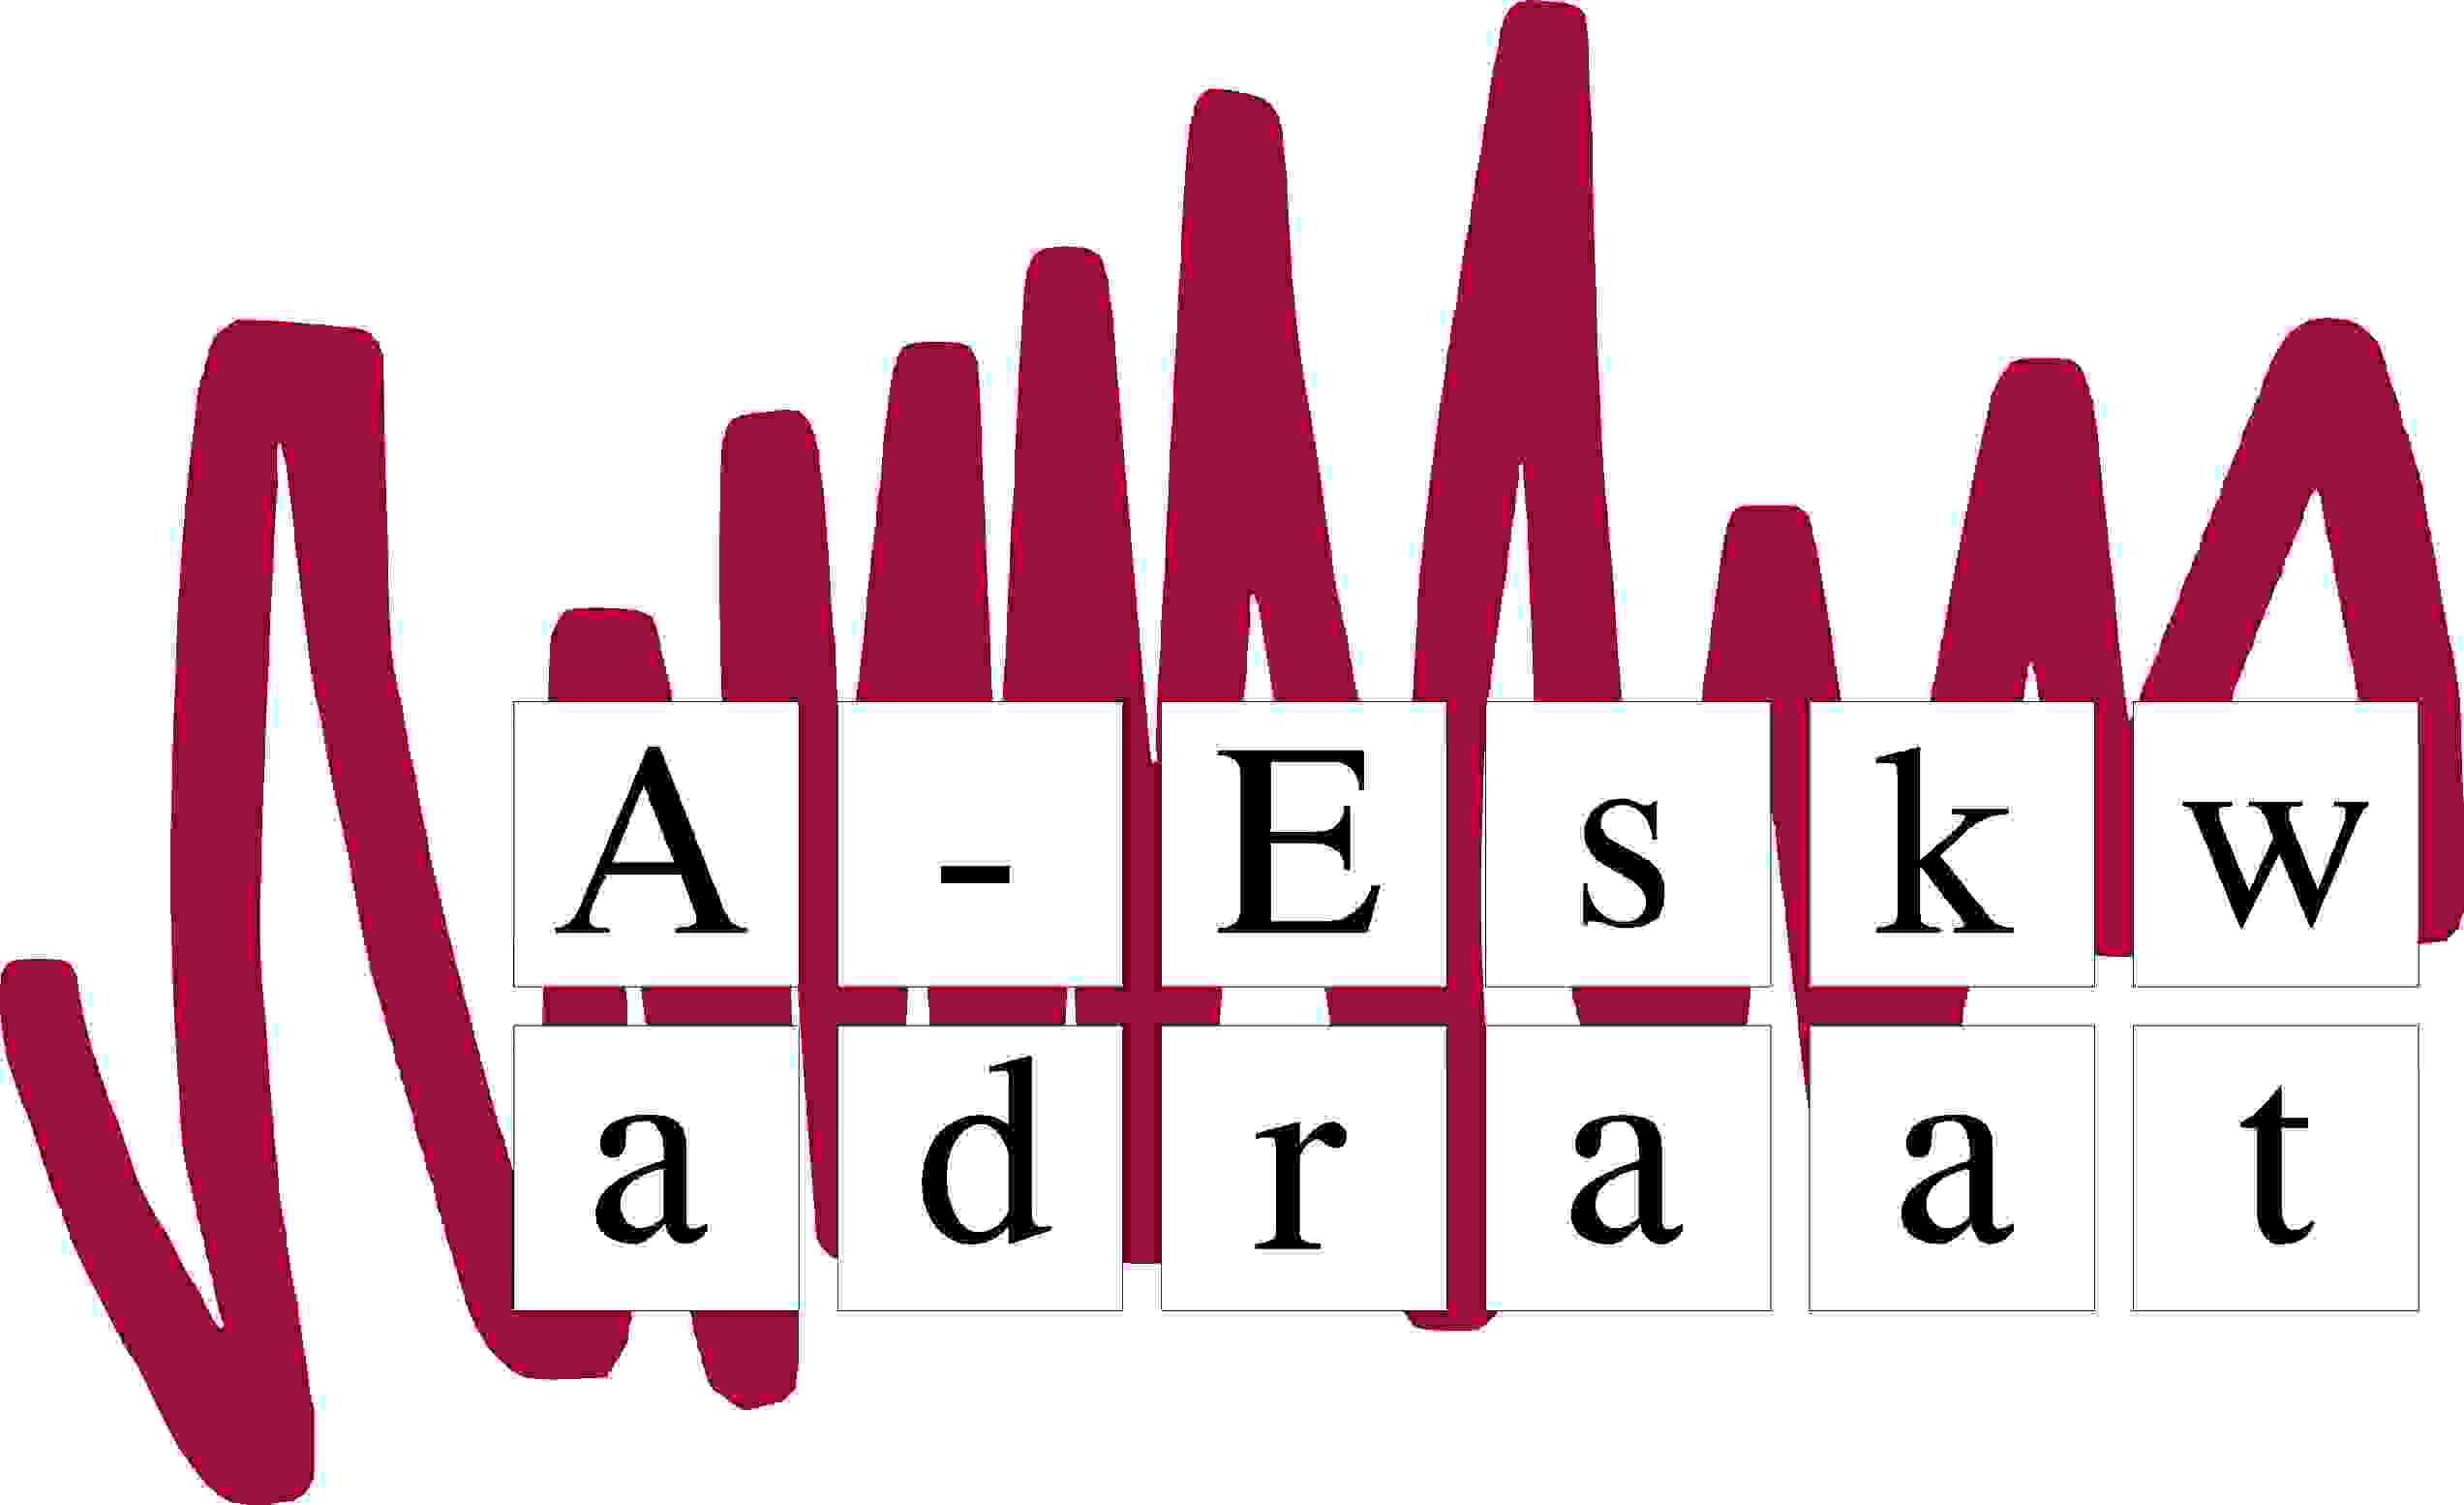 A-Eskwadraat Logo